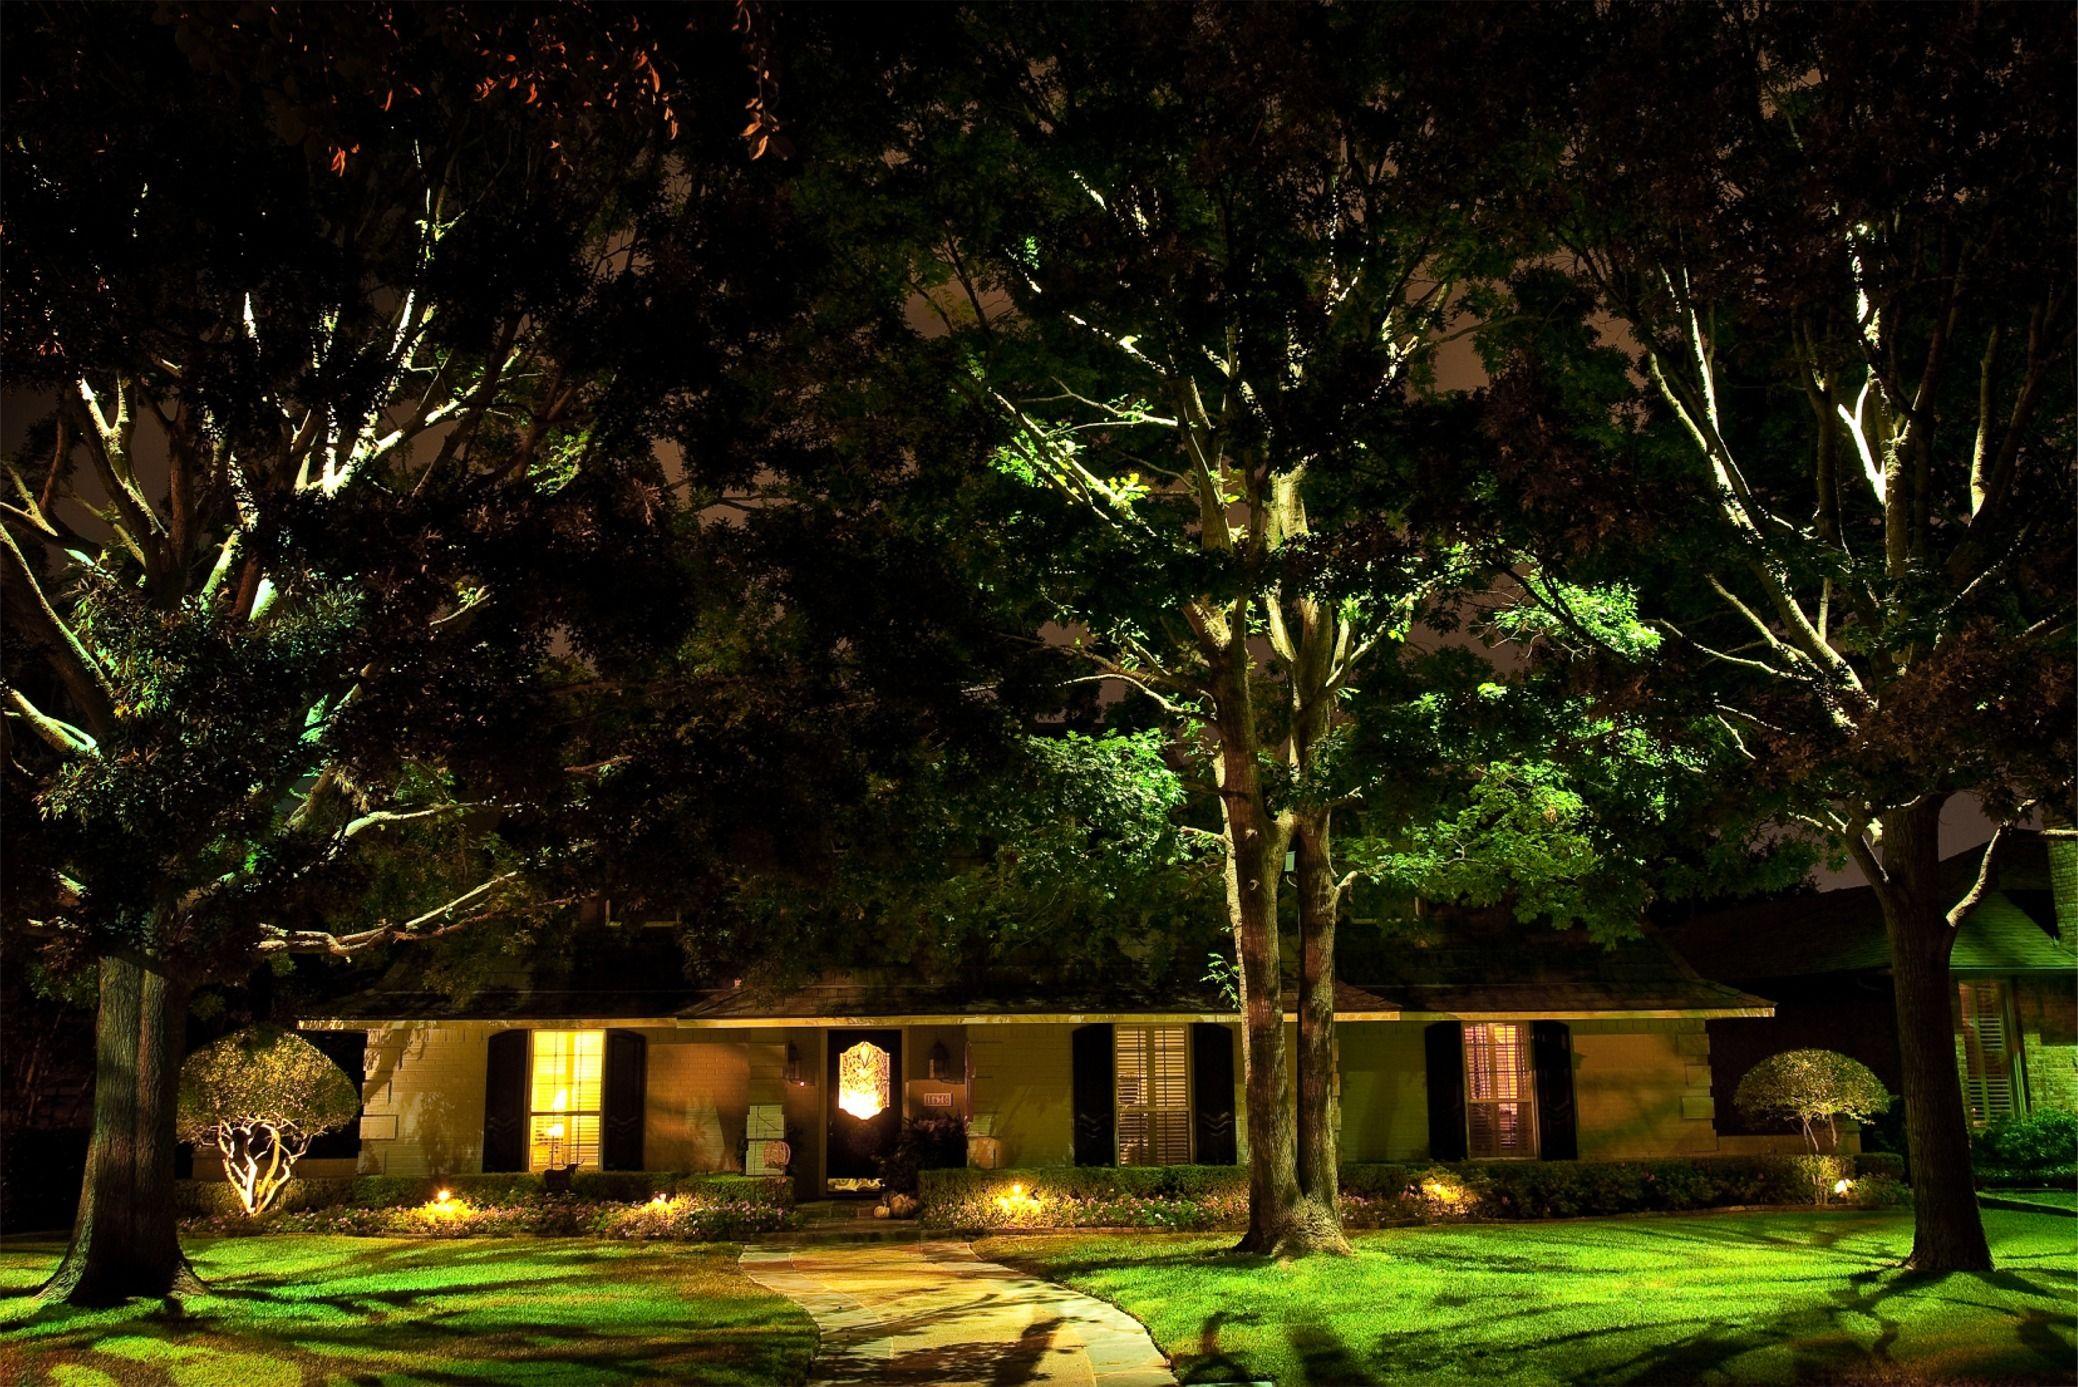 Led Outdoor Landscape Lighting In 2020 Outdoor Lighting Design Led Landscape Lighting Landscape Lighting